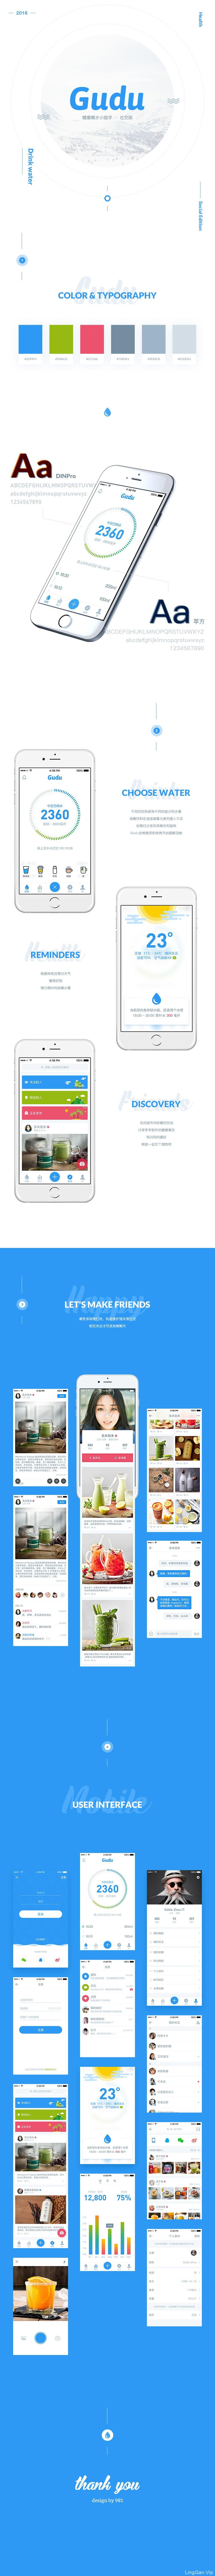 Gudu健康喝水小助手手机APP工具版界面UI设计